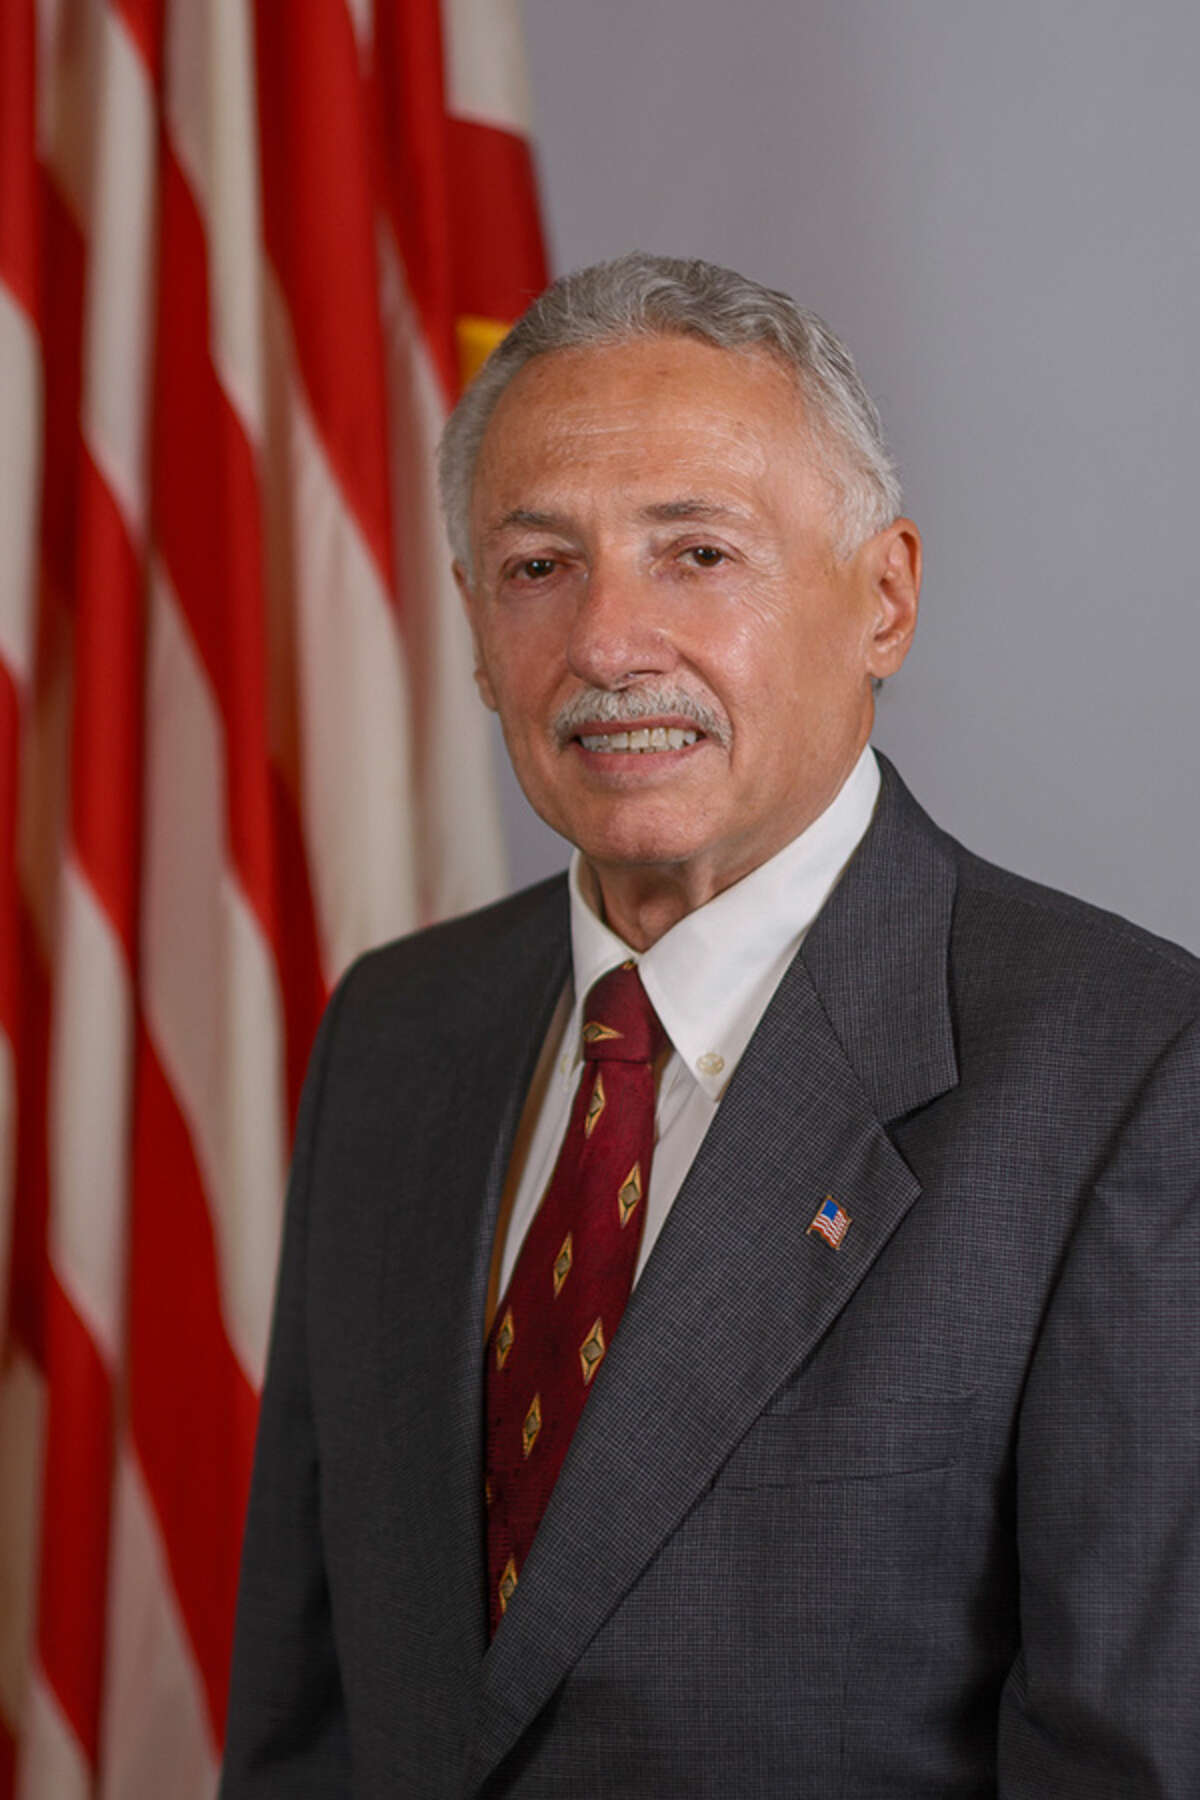 Incumbent City Councilman, Vince Riggi, an independent.